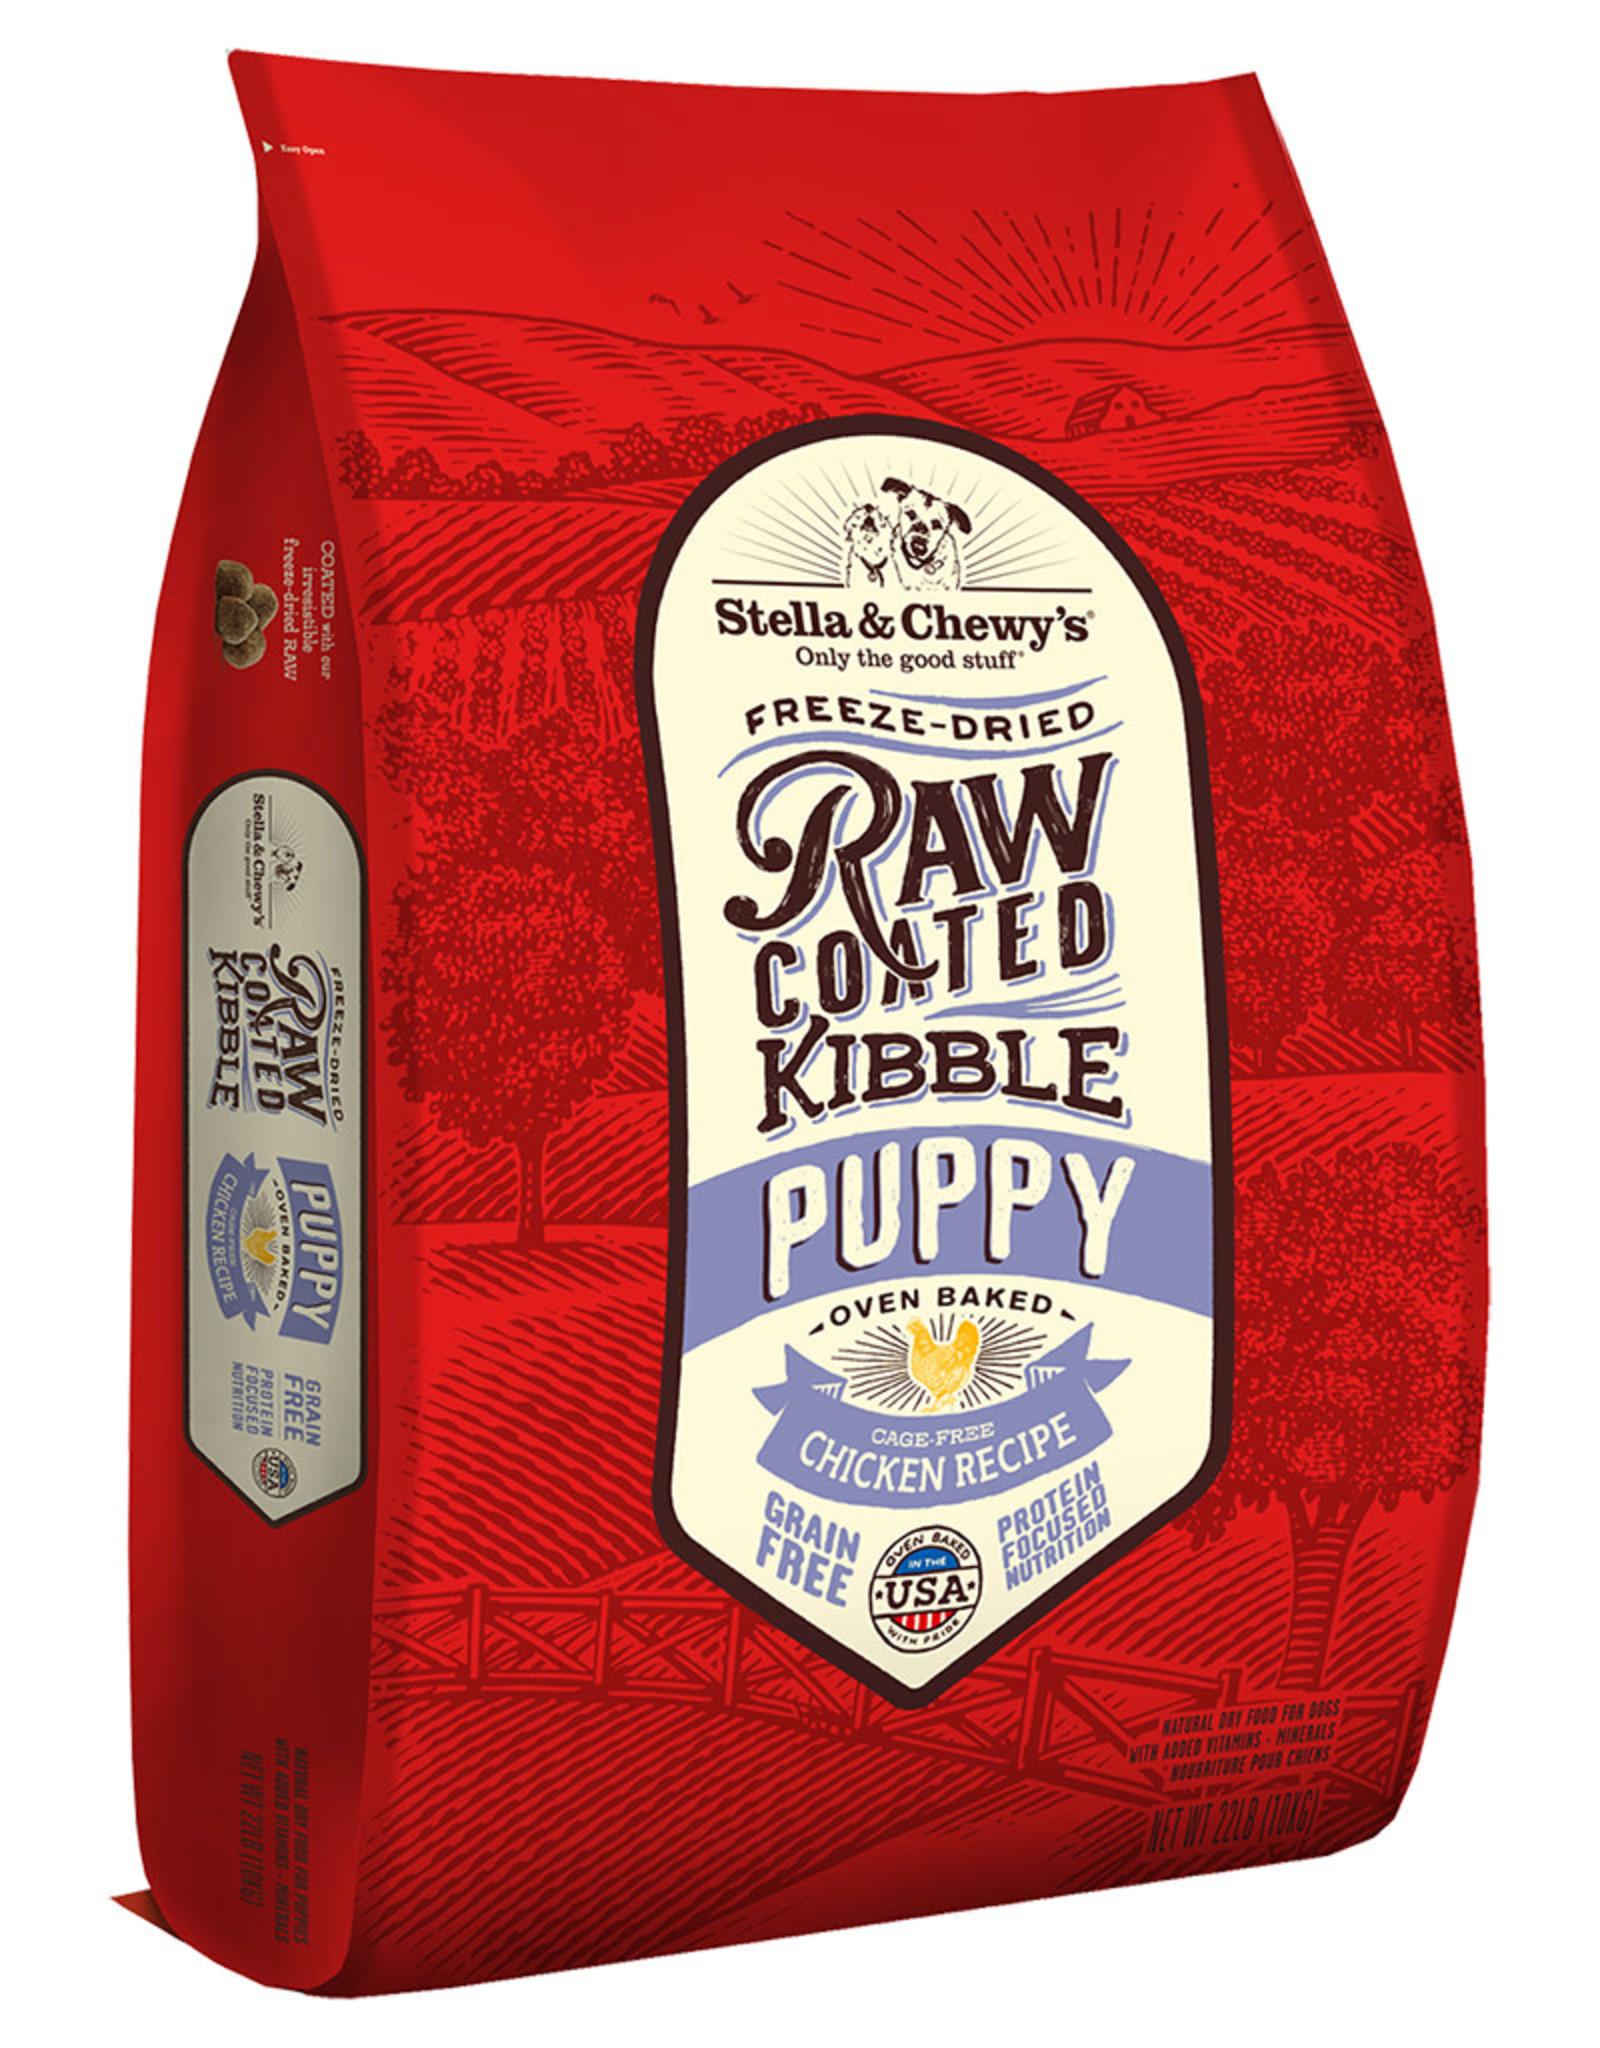 Stella & chewy's SC Raw Coated Chicken Recipe Puppy 20LB